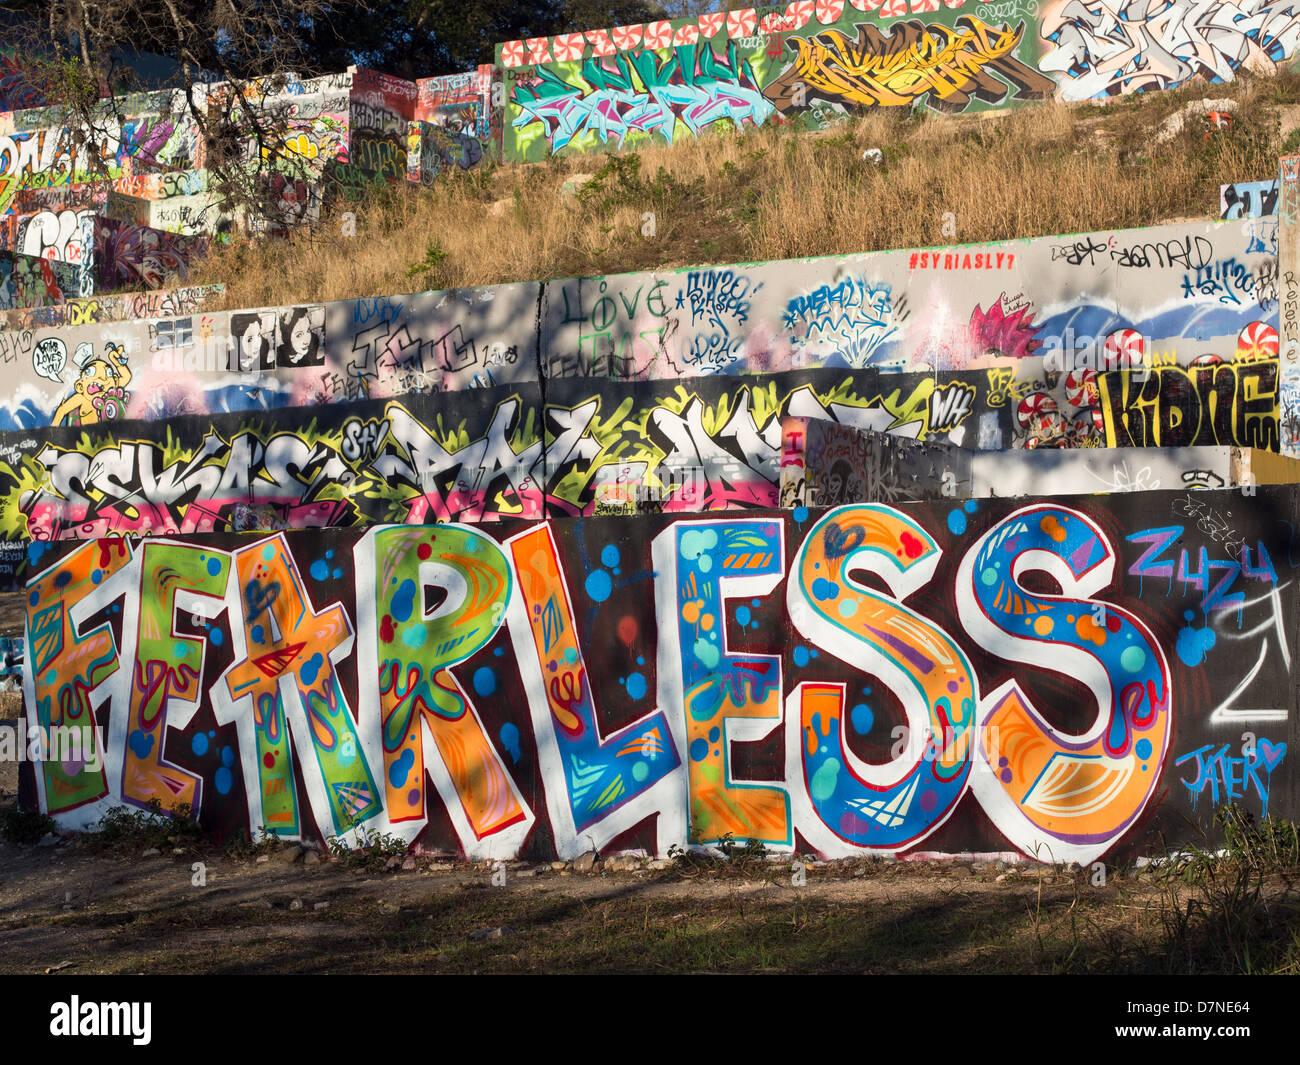 FEARLESS graffiti in Austin, Texas - Stock Image